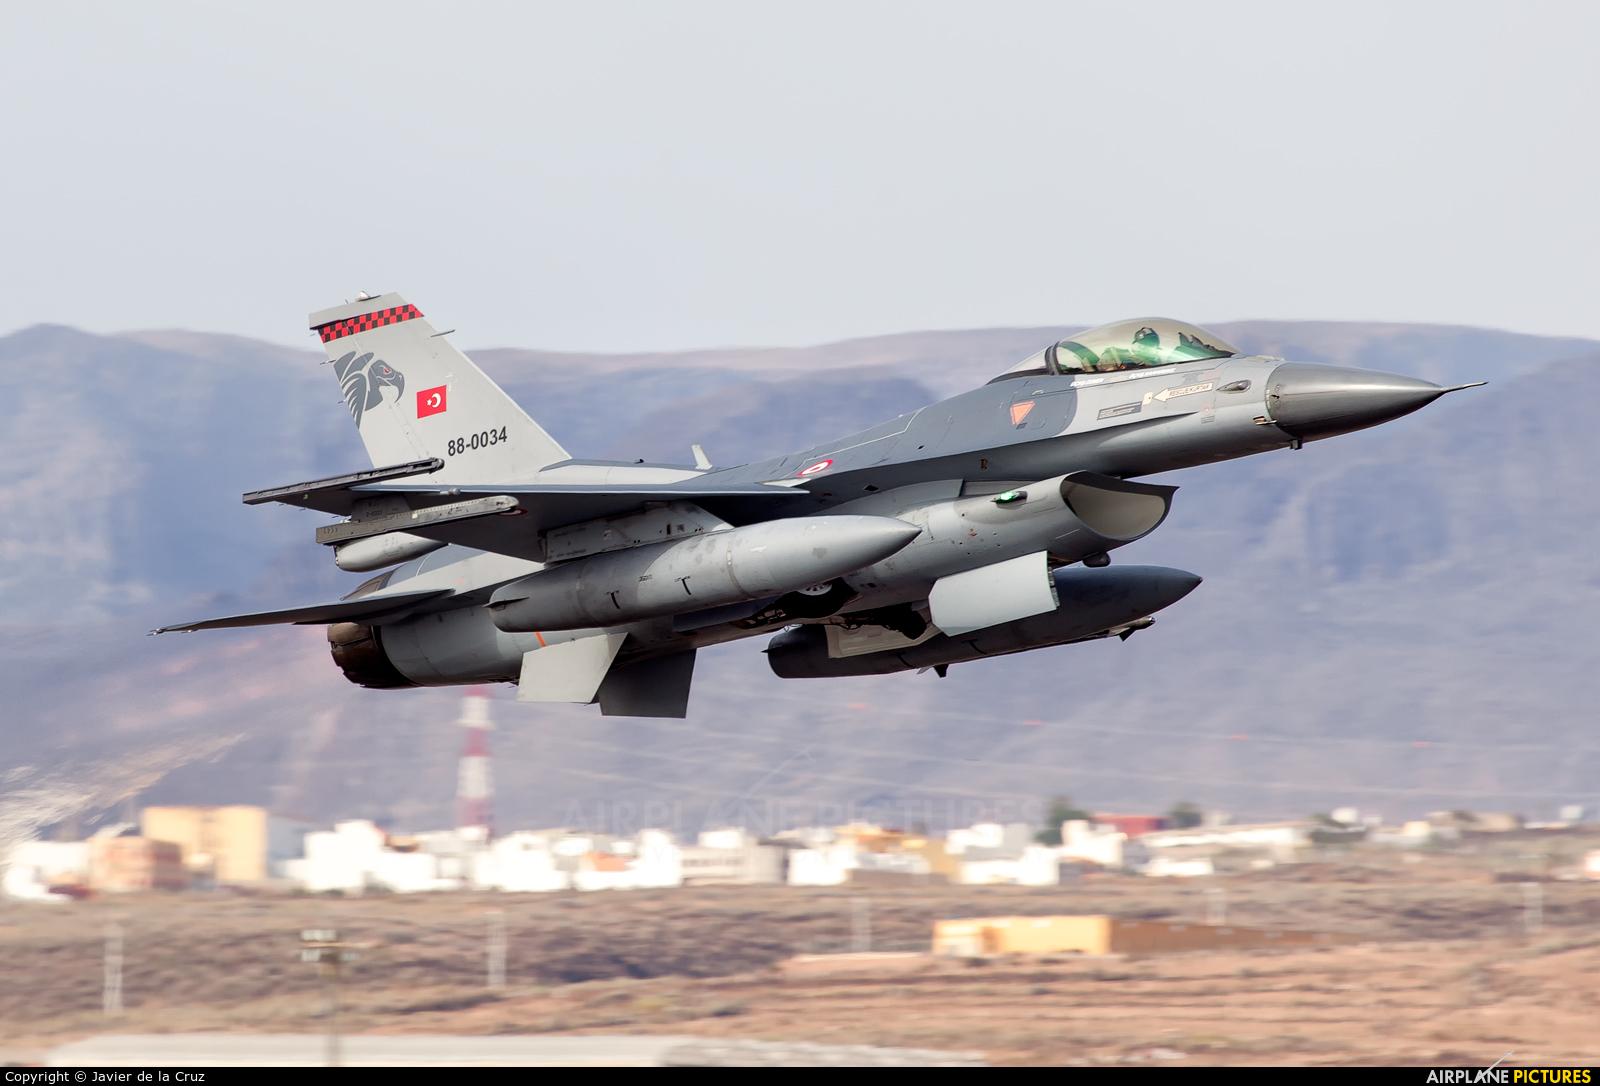 Turkey - Air Force 88-0034 aircraft at Aeropuerto de Gran Canaria